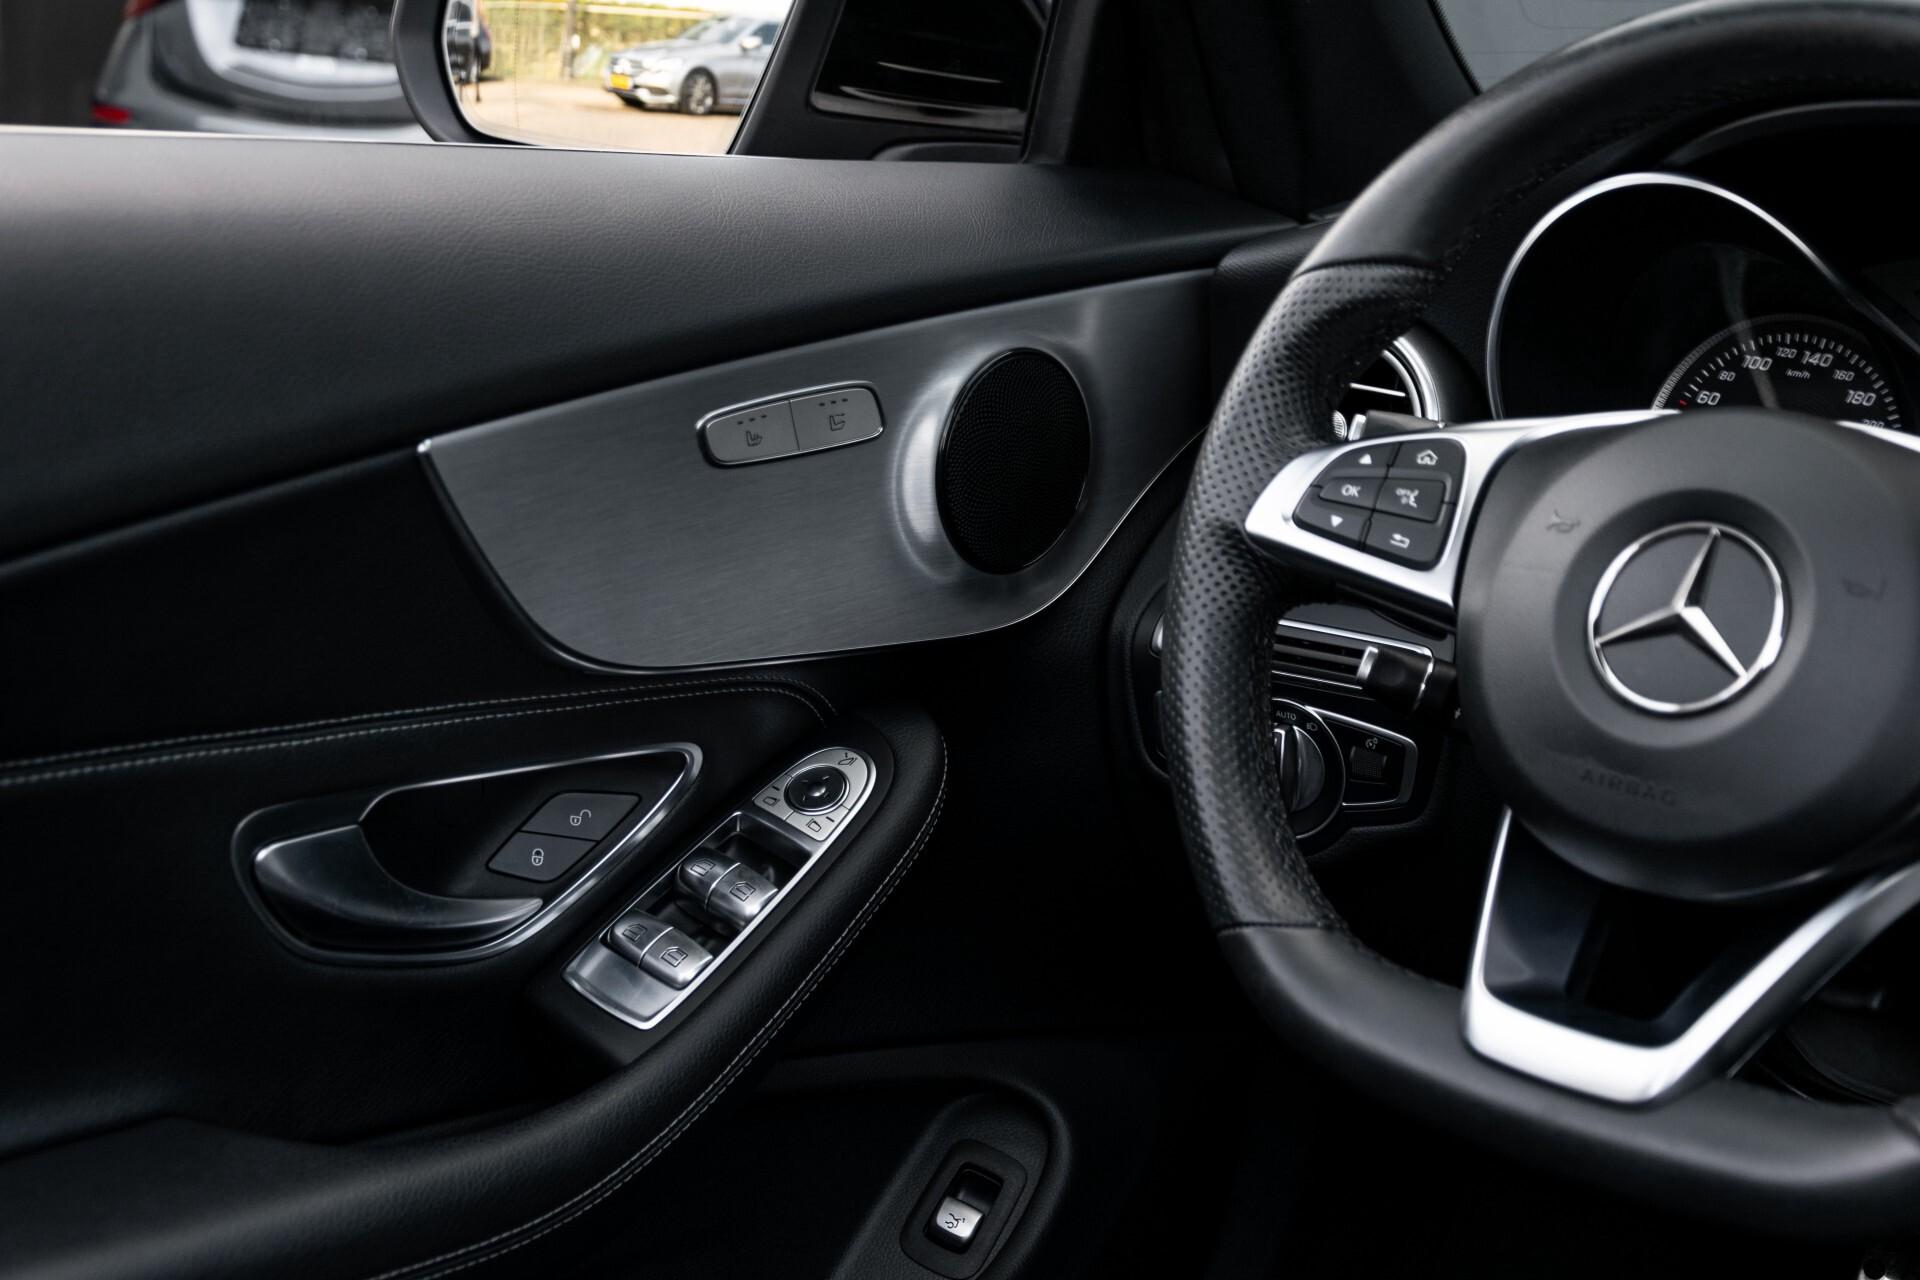 Mercedes-Benz C-Klasse Cabrio 250 AMG Airscarf/Aircap/Comand/ILS/Camera/Rode cabriokap Aut9 Foto 46